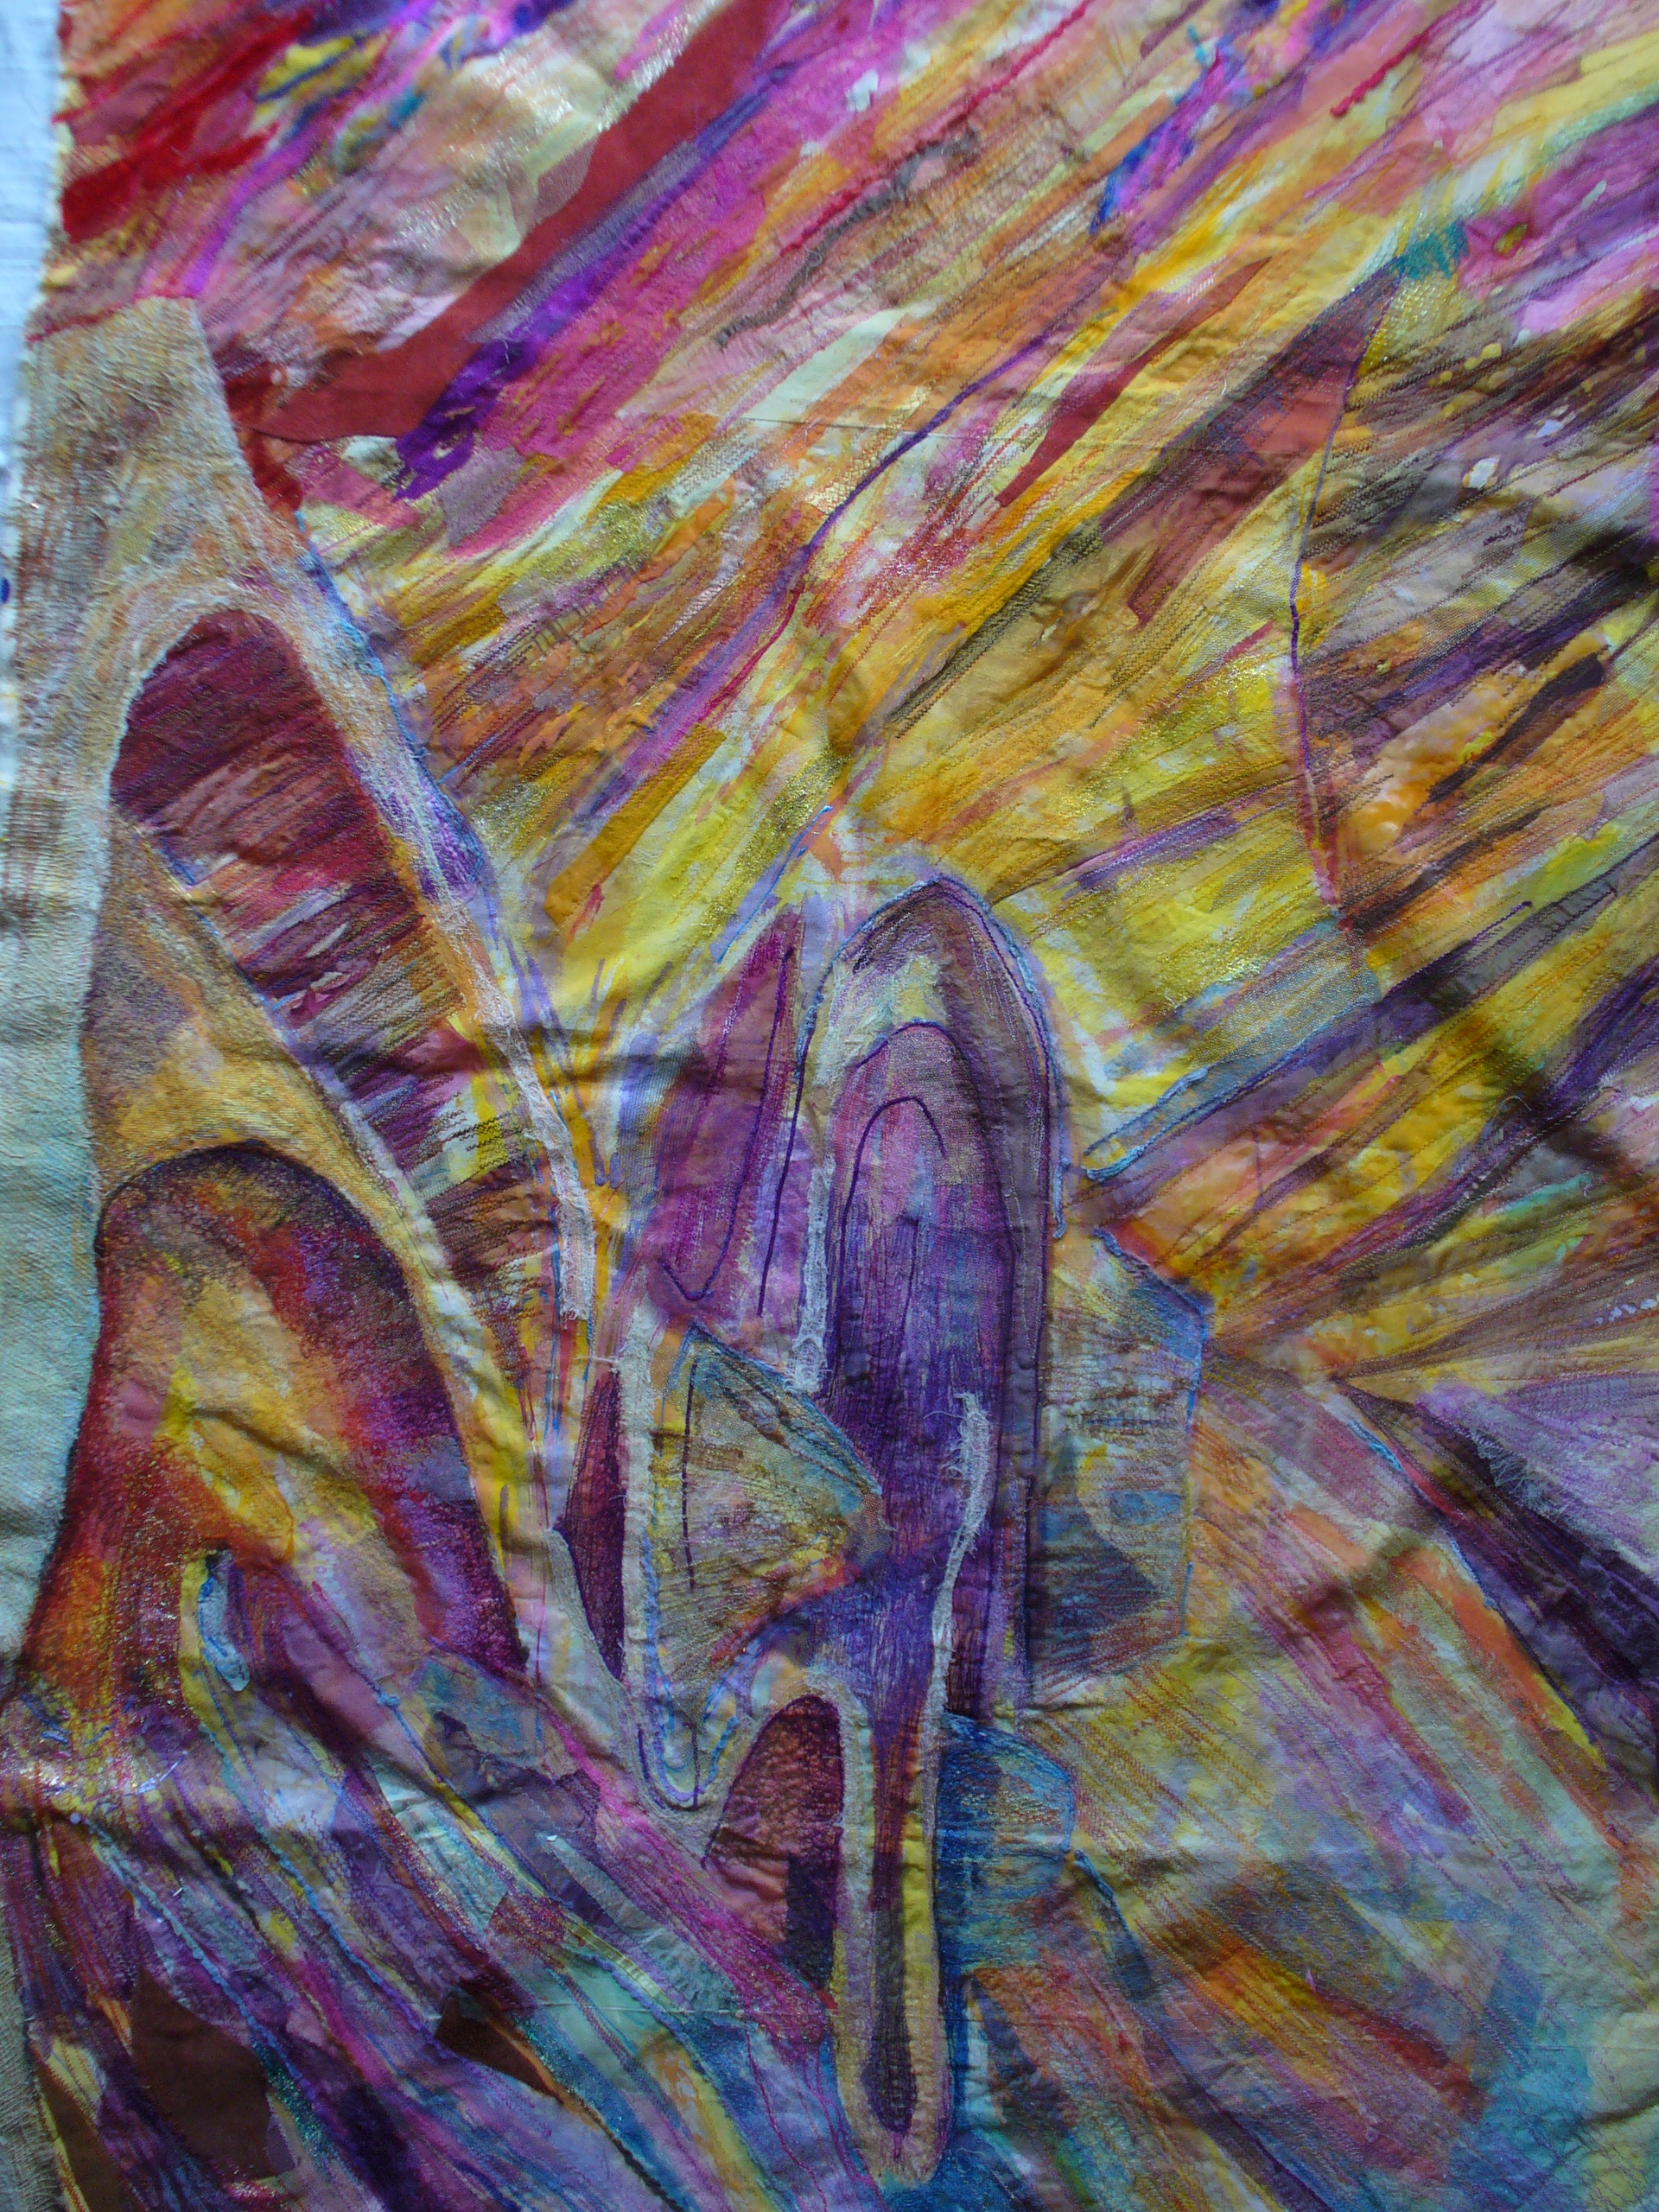 Copper Mountain by Liz Shelbourne